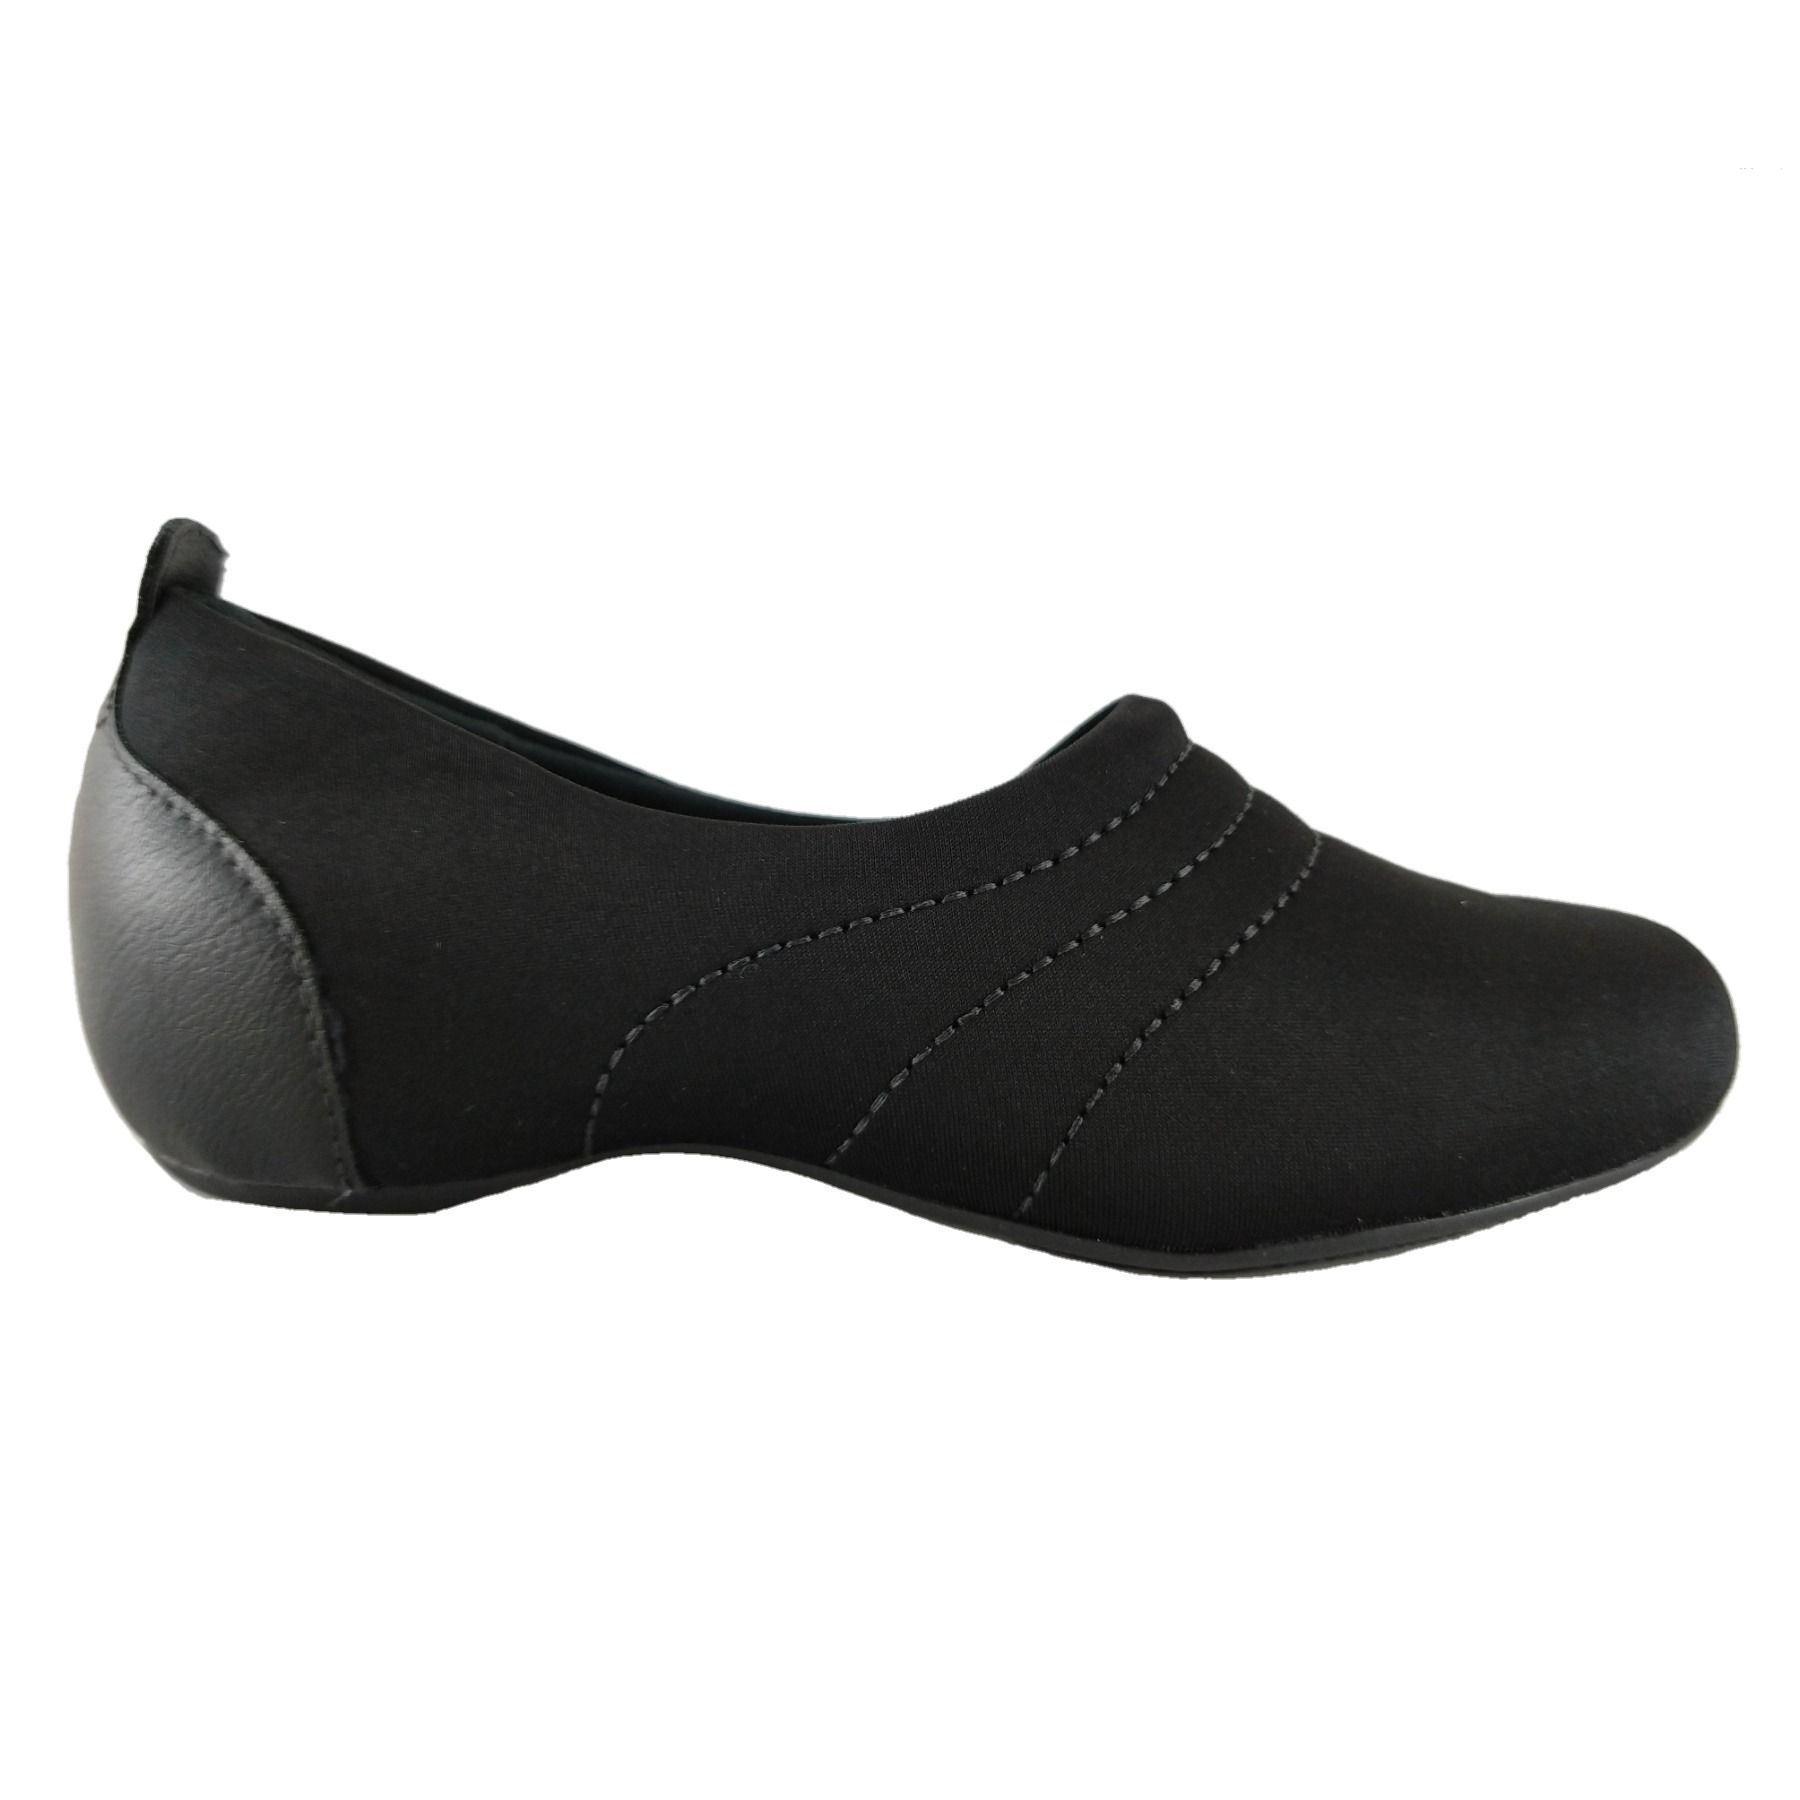 Sapatilha Confort SapatoWeb Flex Lycra Preto  - SAPATOWEB.COM